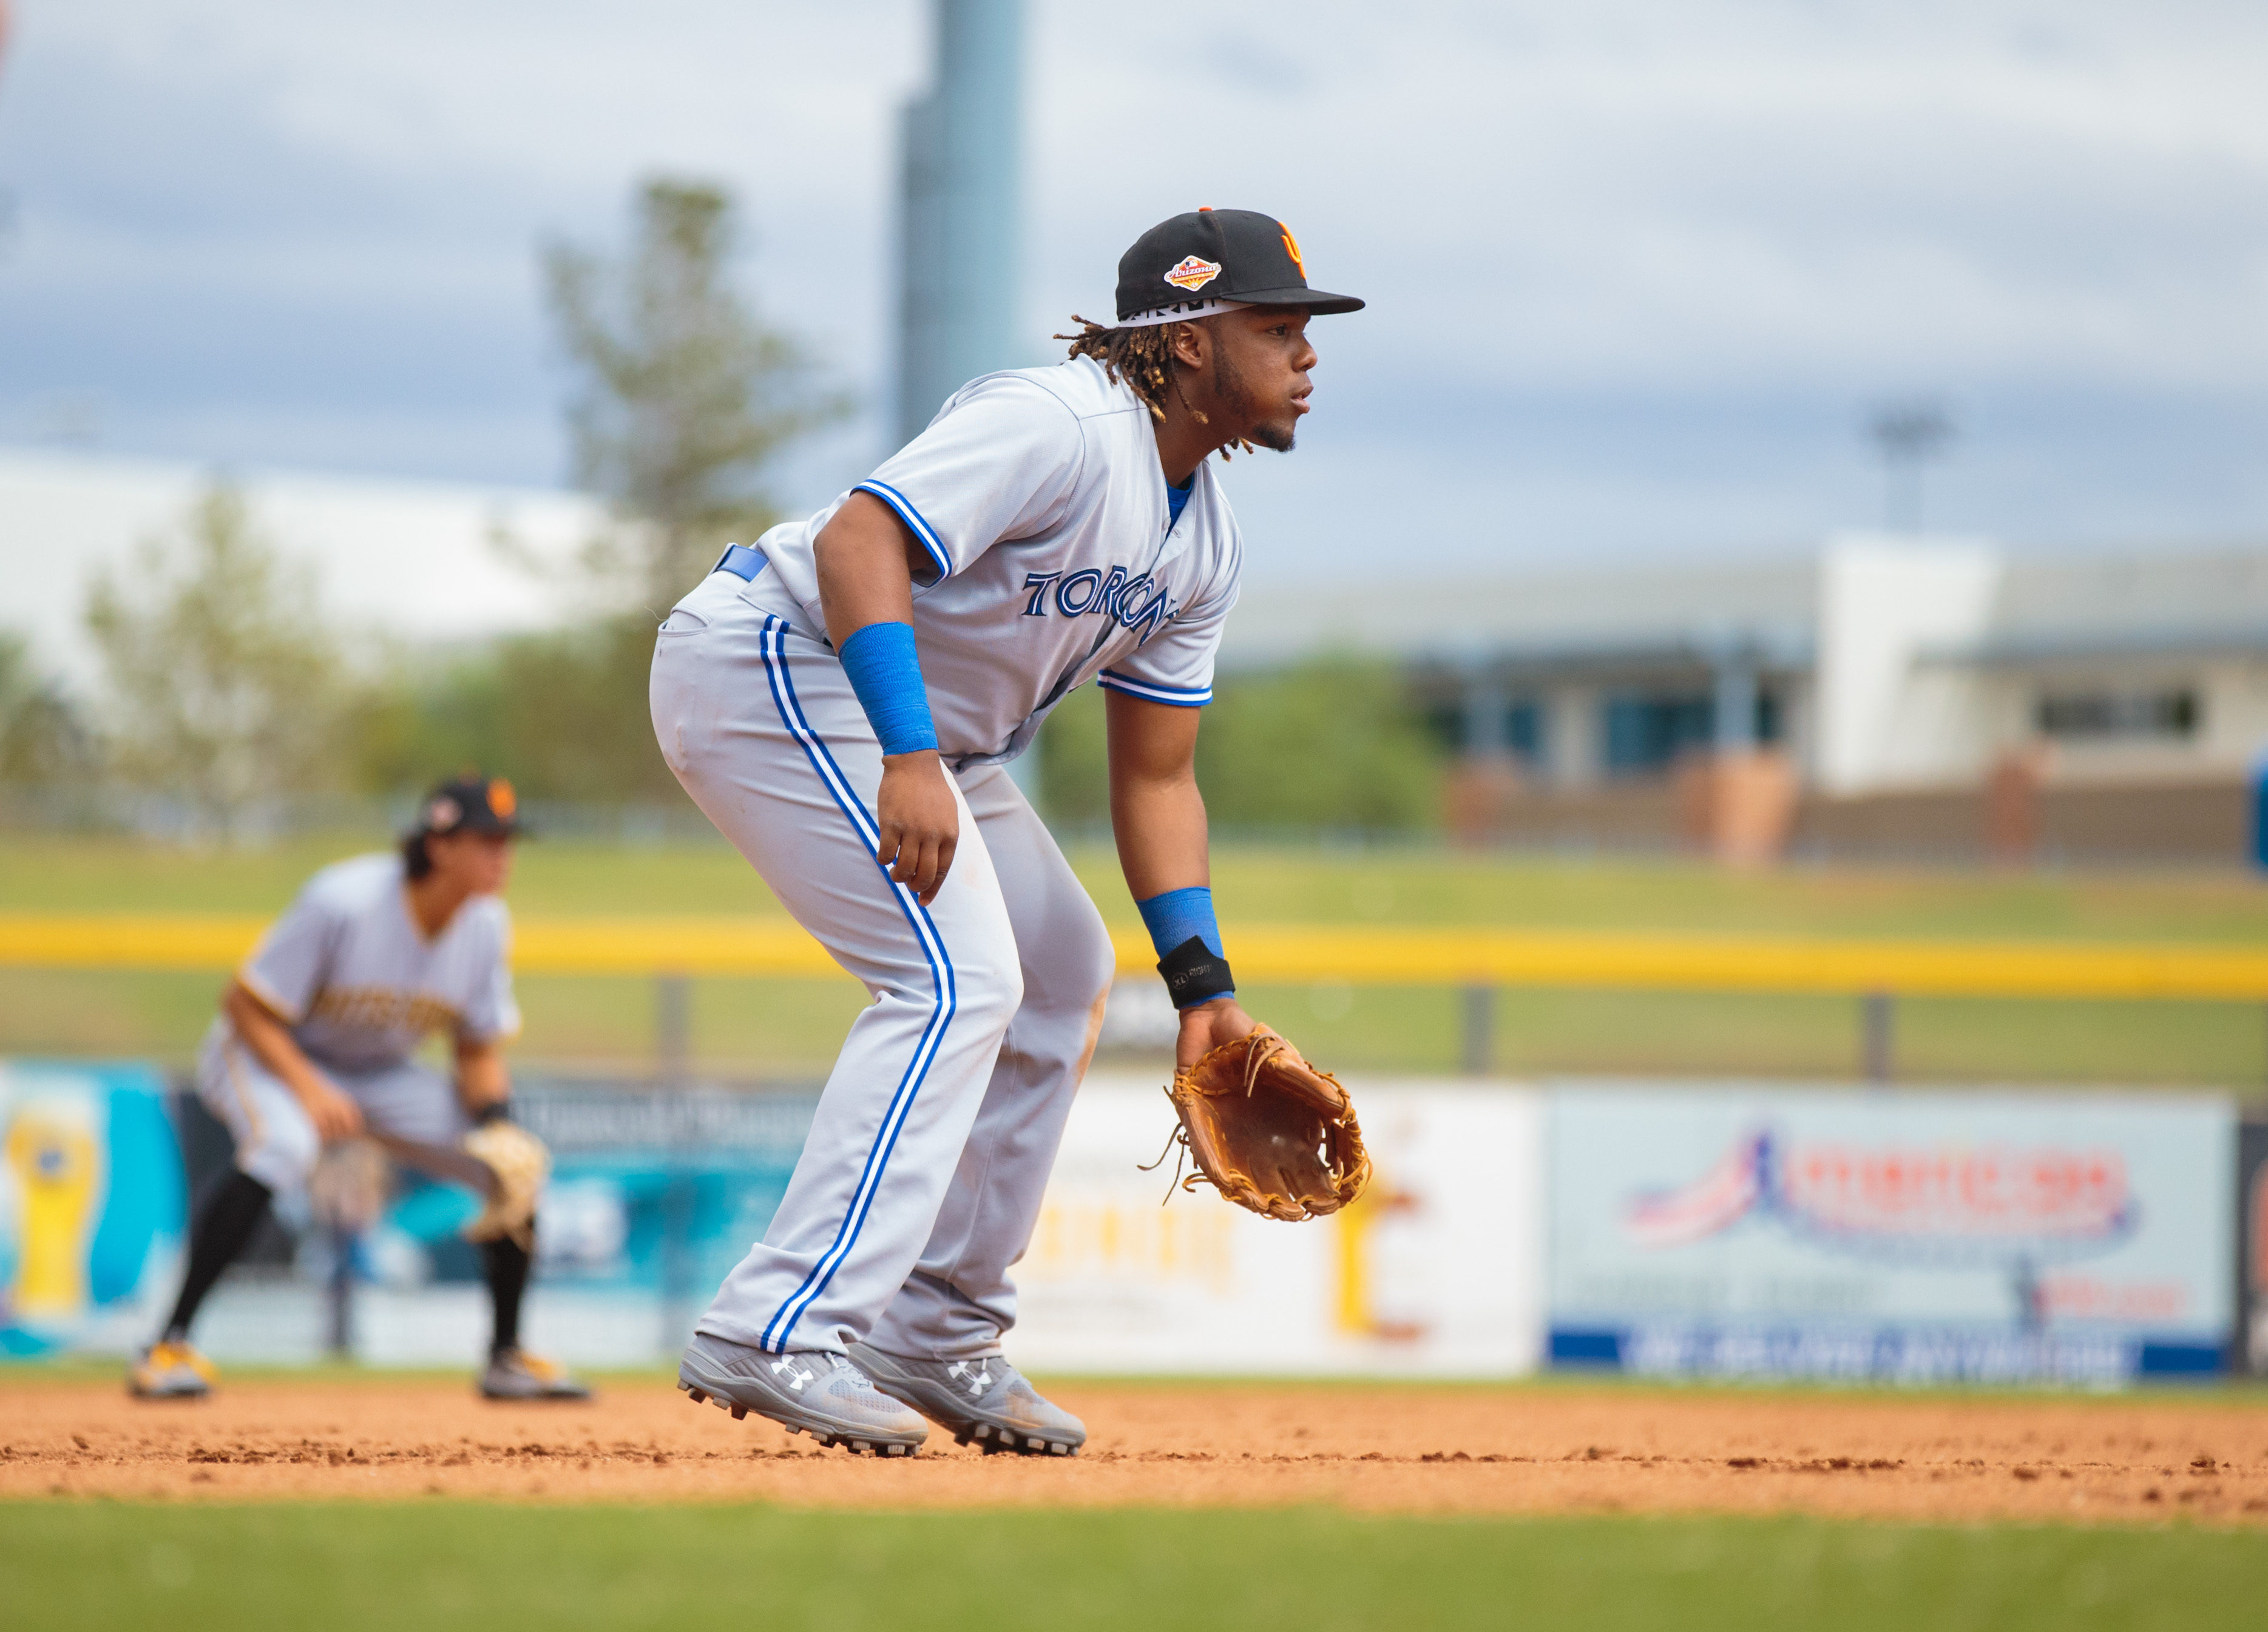 Minor League Baseball: Arizona Fall League-Surprise Saguaros at Peoria Javelinas